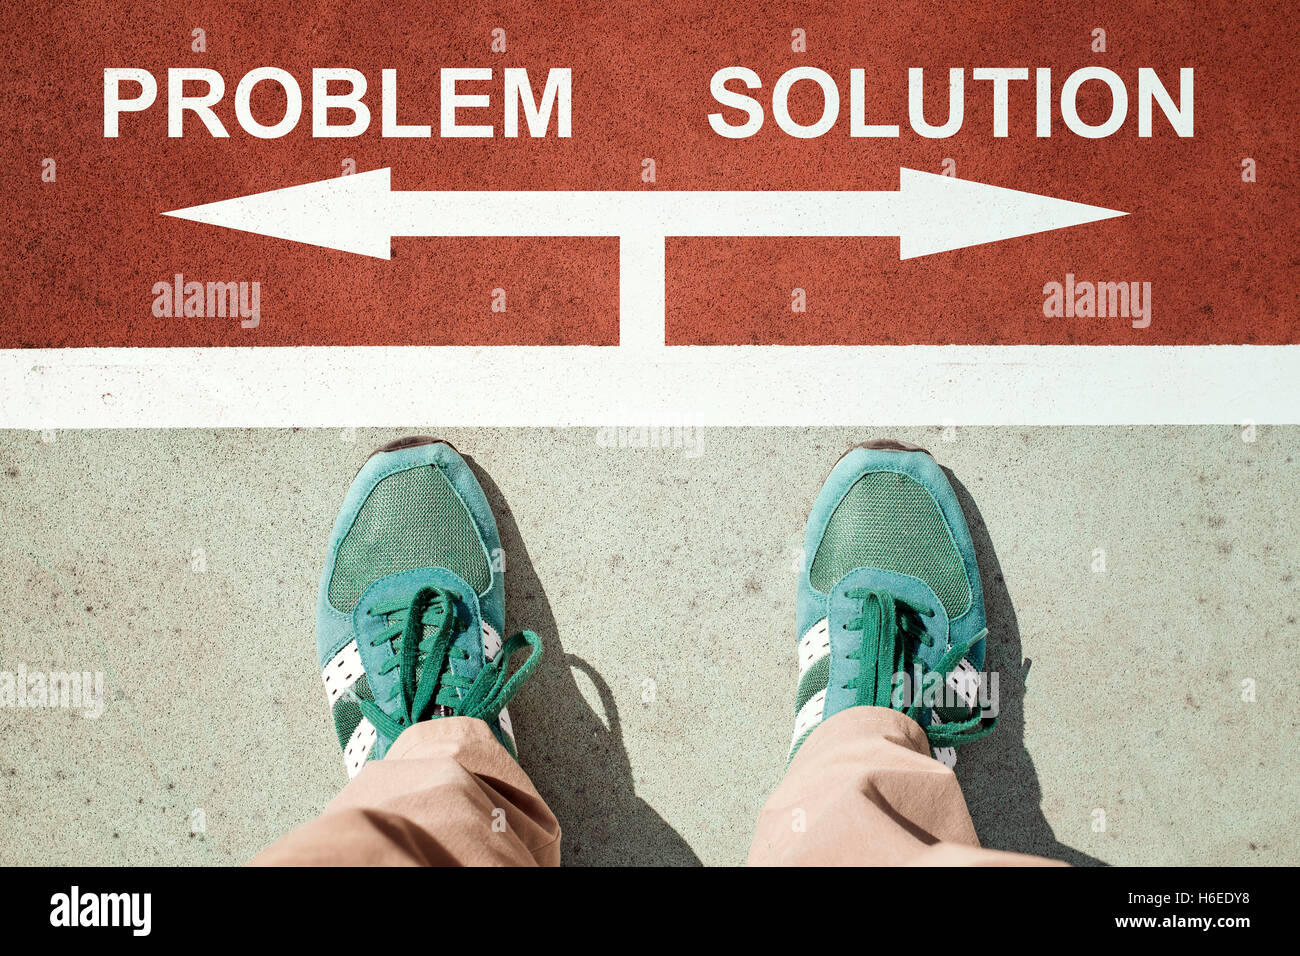 Concepto de solución o problema con las piernas por encima de pie sobre signos Imagen De Stock